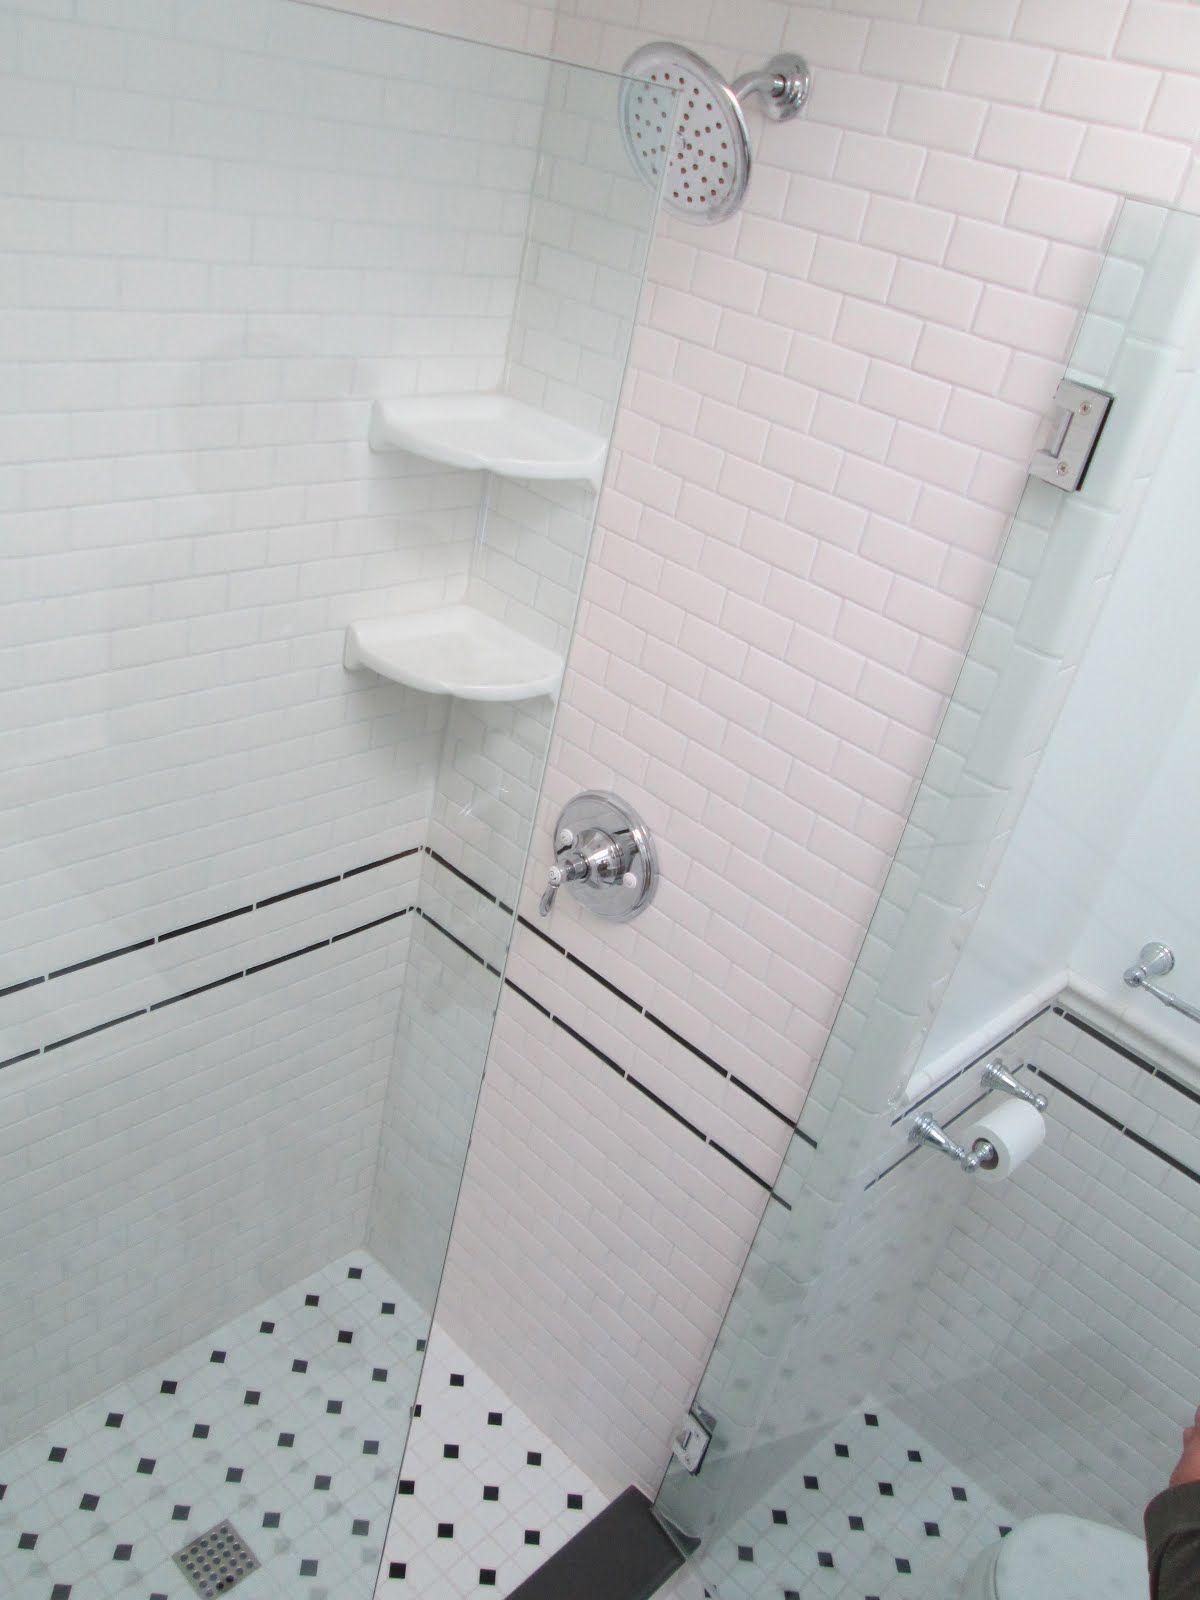 Pink Black And White Bathroom Ideas Part - 32: Classic Bathroom Floor Licious Bathroom Design Terrific Black White Vintage  Bathroom Tile Walk In Shower Designs : Classic Black White Bathroom Tile  Ideas